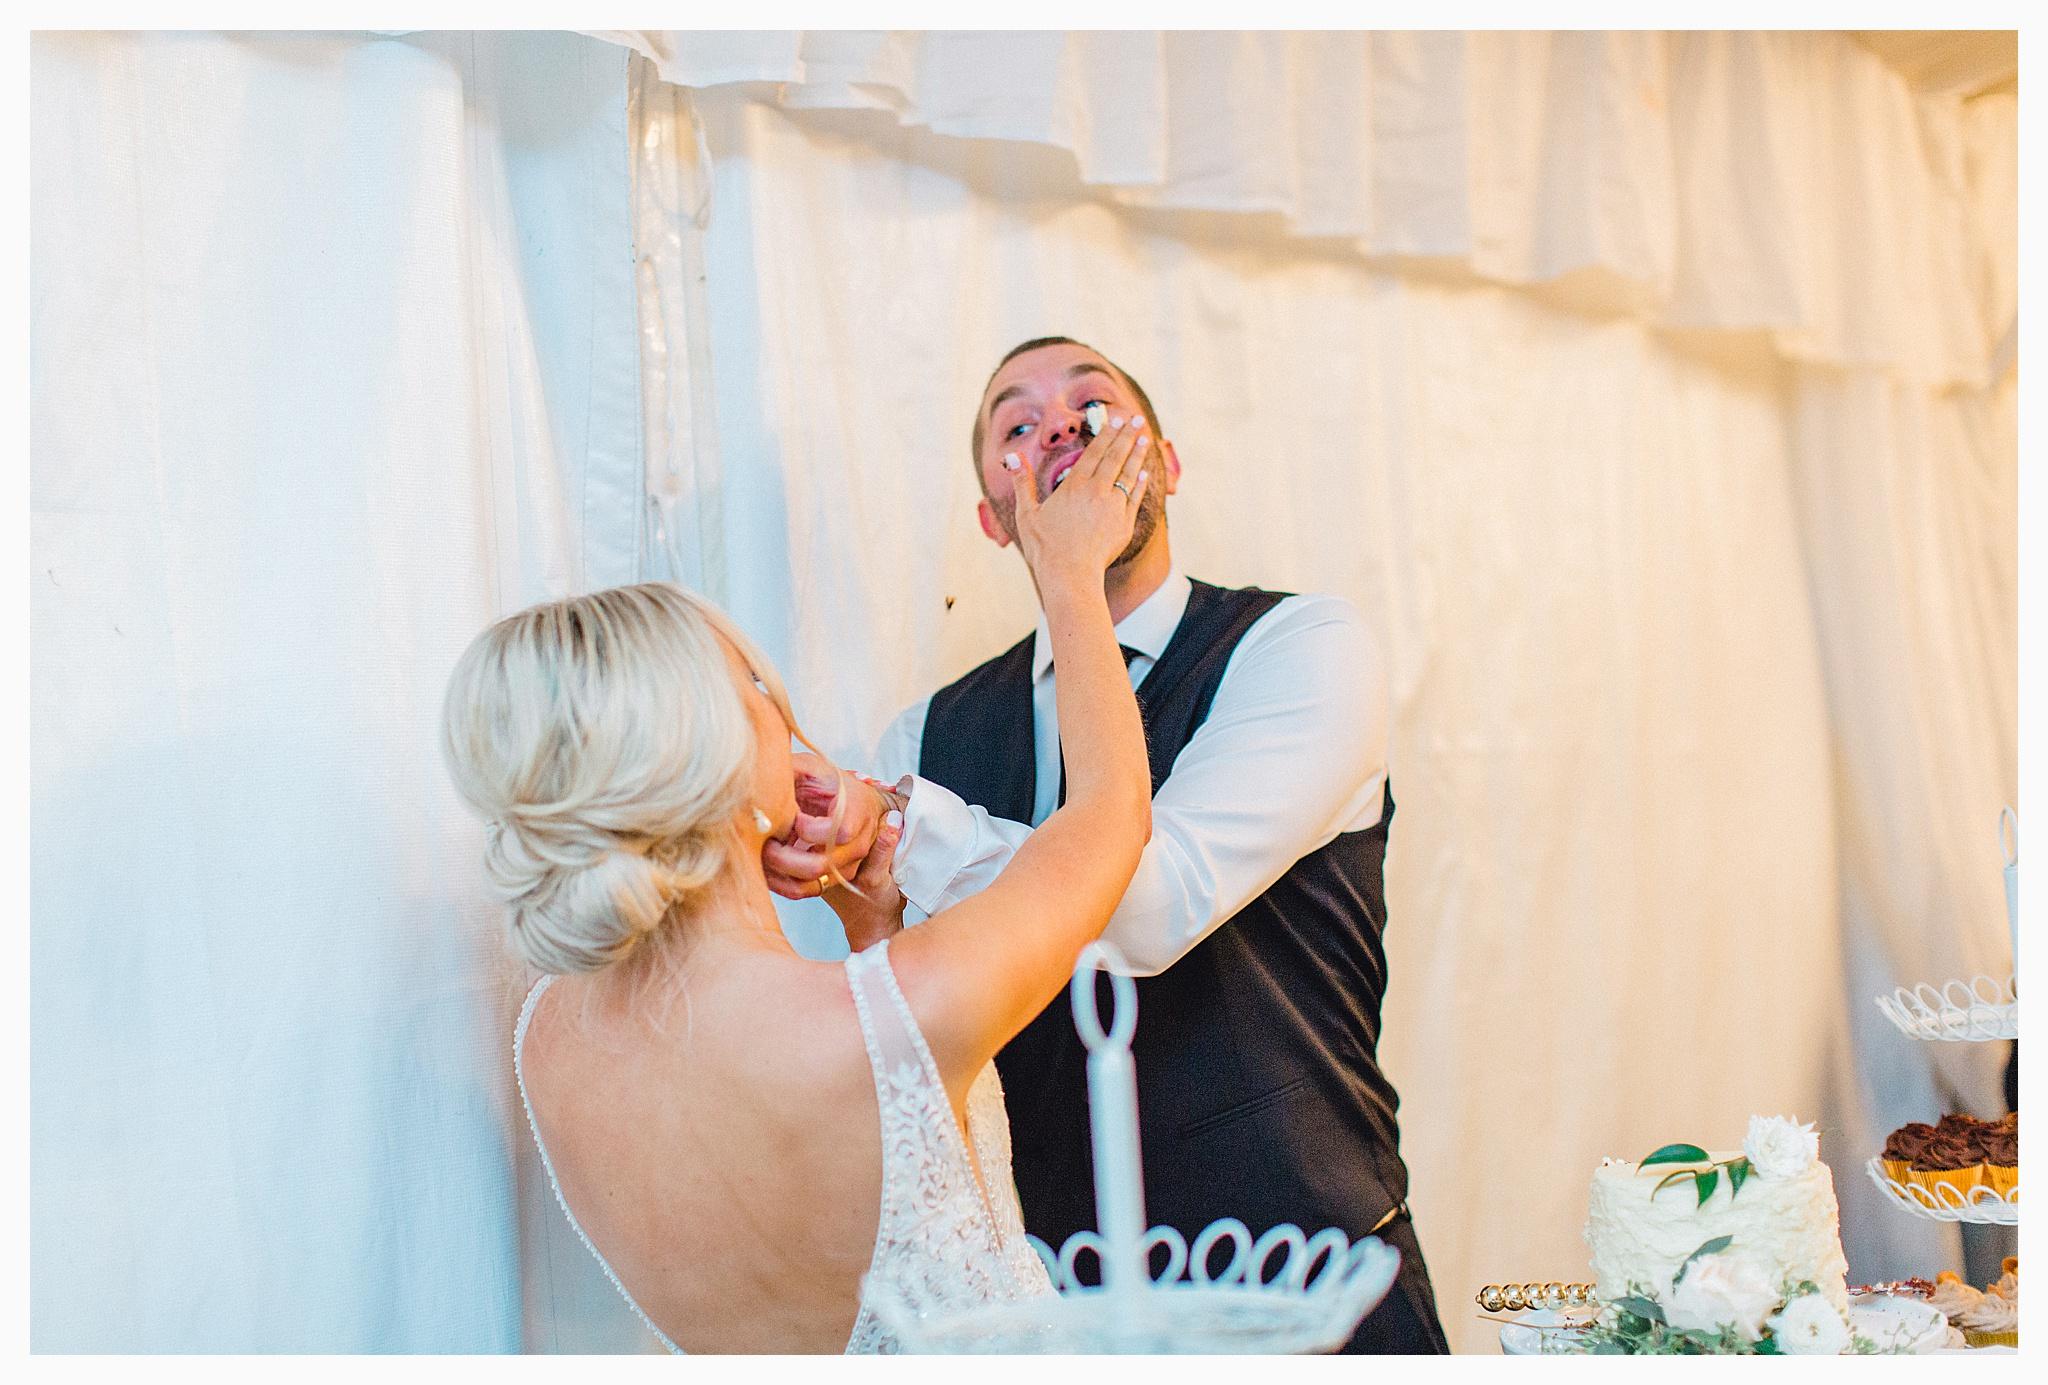 Emma Rose Company Light and Airy Wedding Photographer, Beautiful fall wedding at Rock Creek Gardens Venue in Puyallup, Washington._0105.jpg